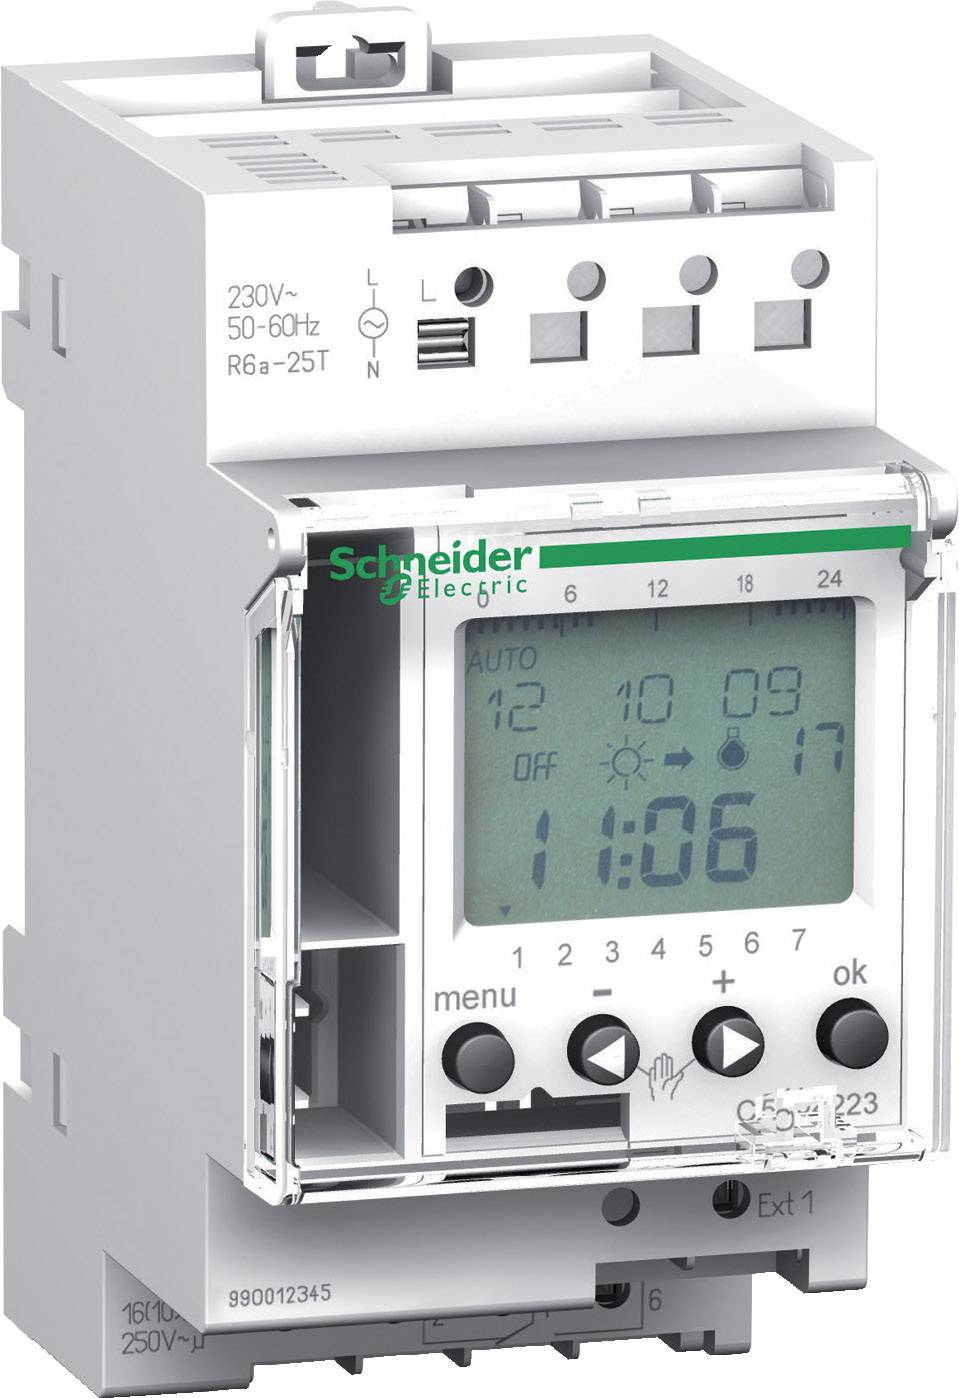 Řezačka CCT15224 Ic Astro 1kanálový Schneider Electric CCT15224